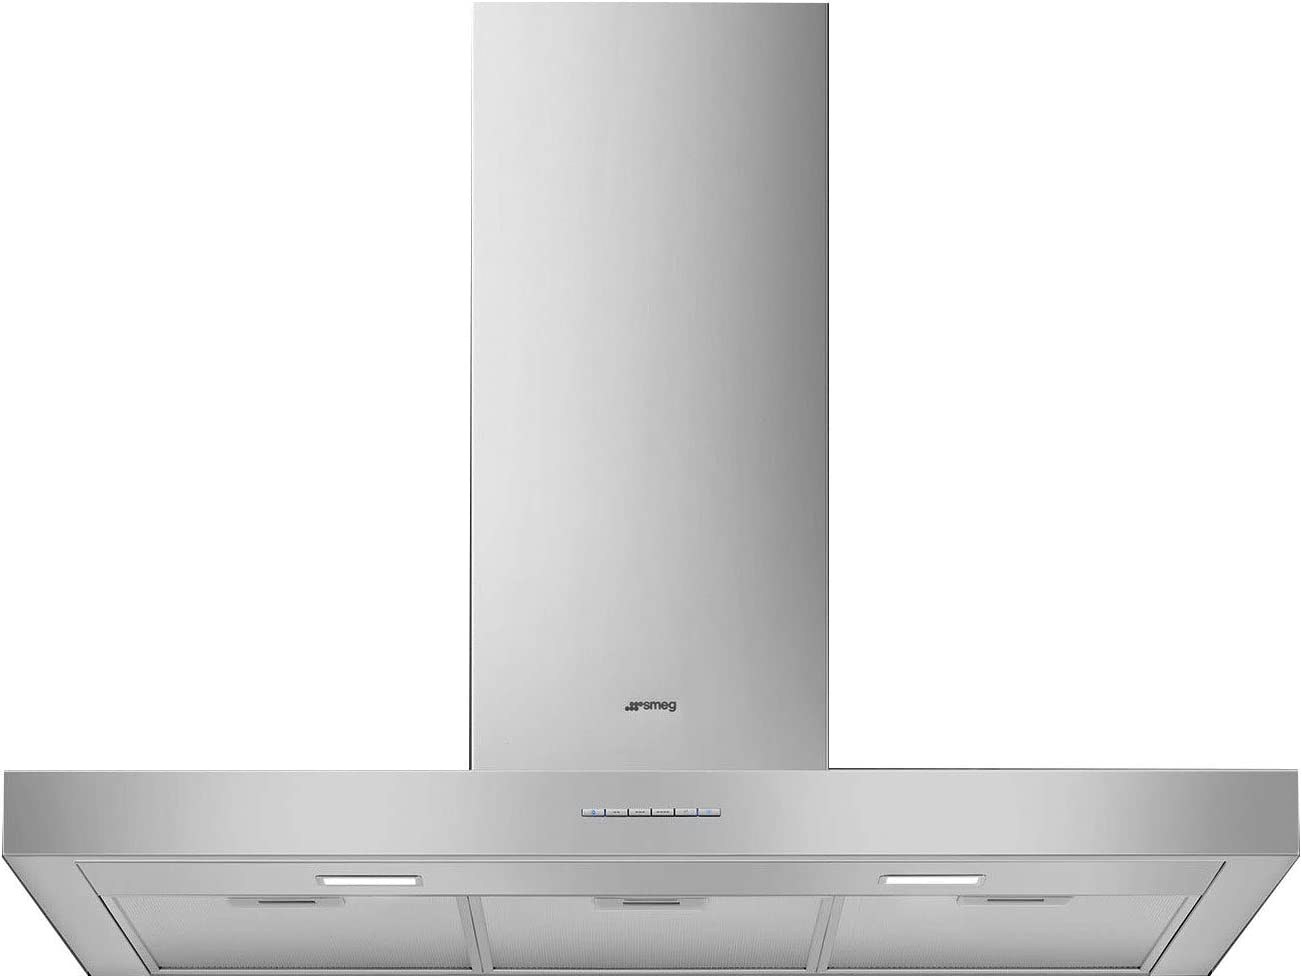 Campana Smeg Kbt900xe Decorativa 90cm Inox: Amazon.es: Grandes electrodomésticos